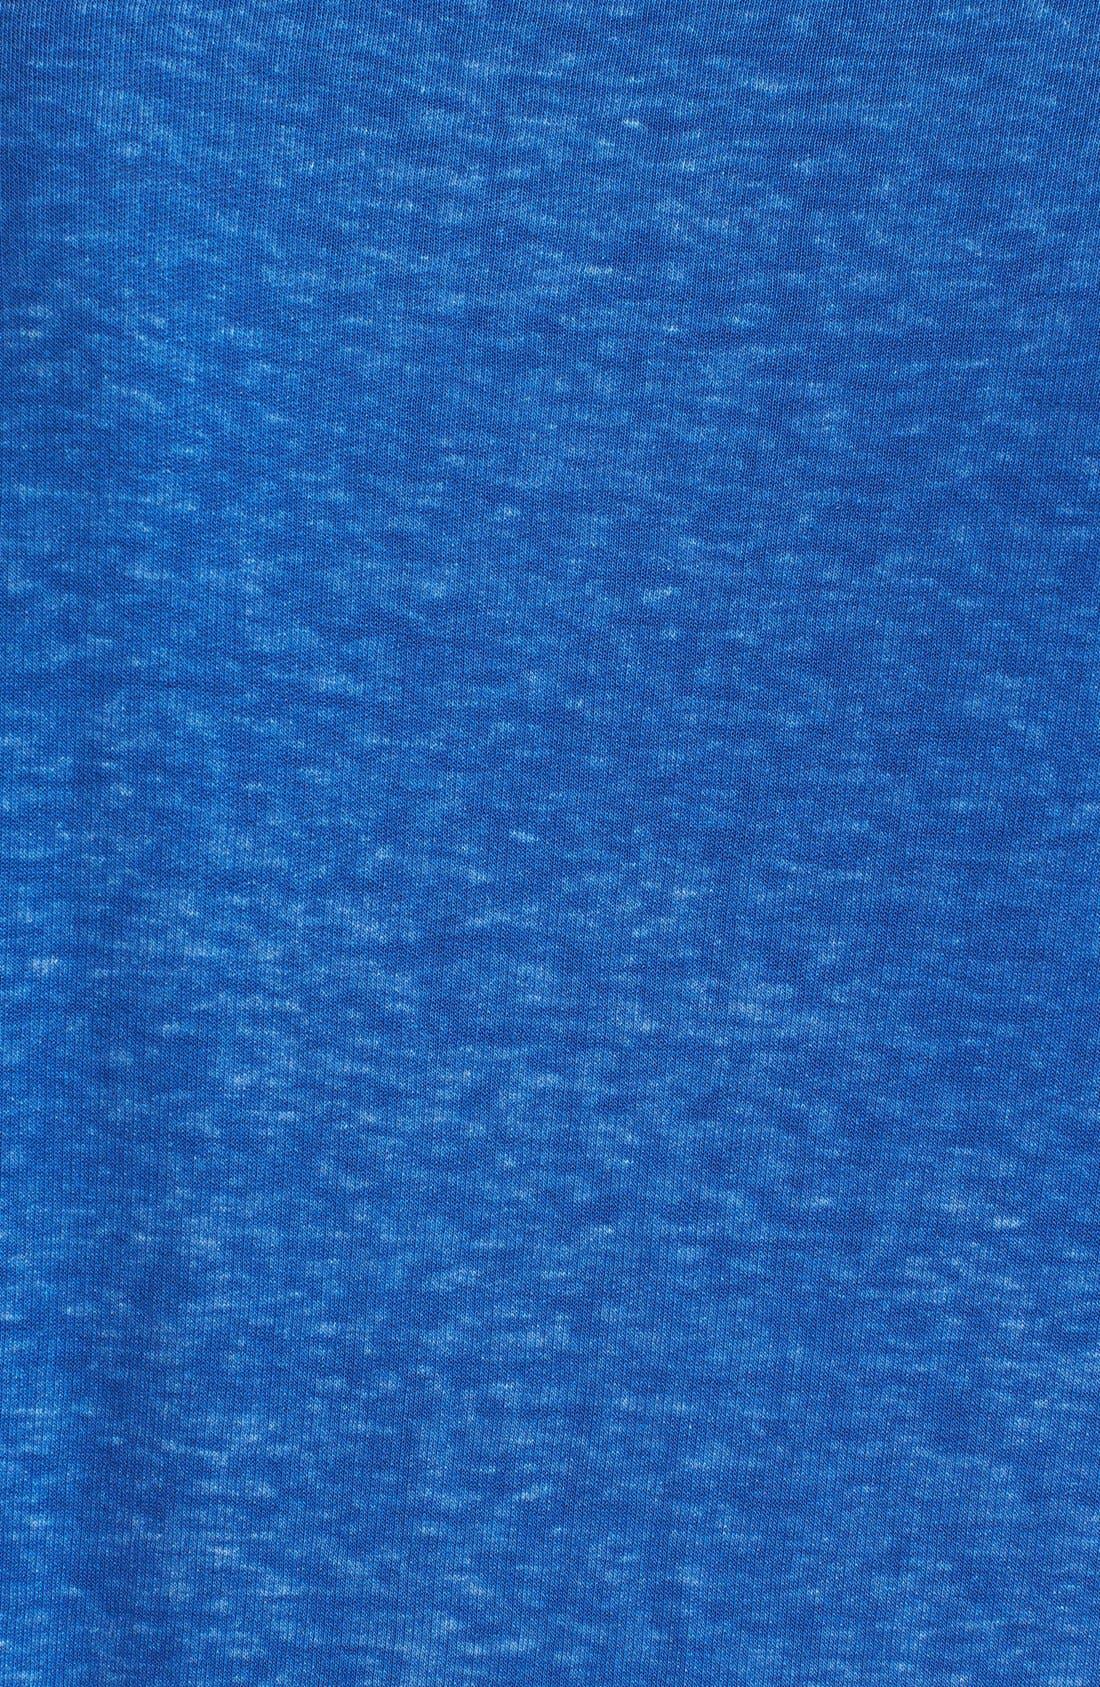 Washed Raglan Sleeve Sweatshirt,                             Alternate thumbnail 11, color,